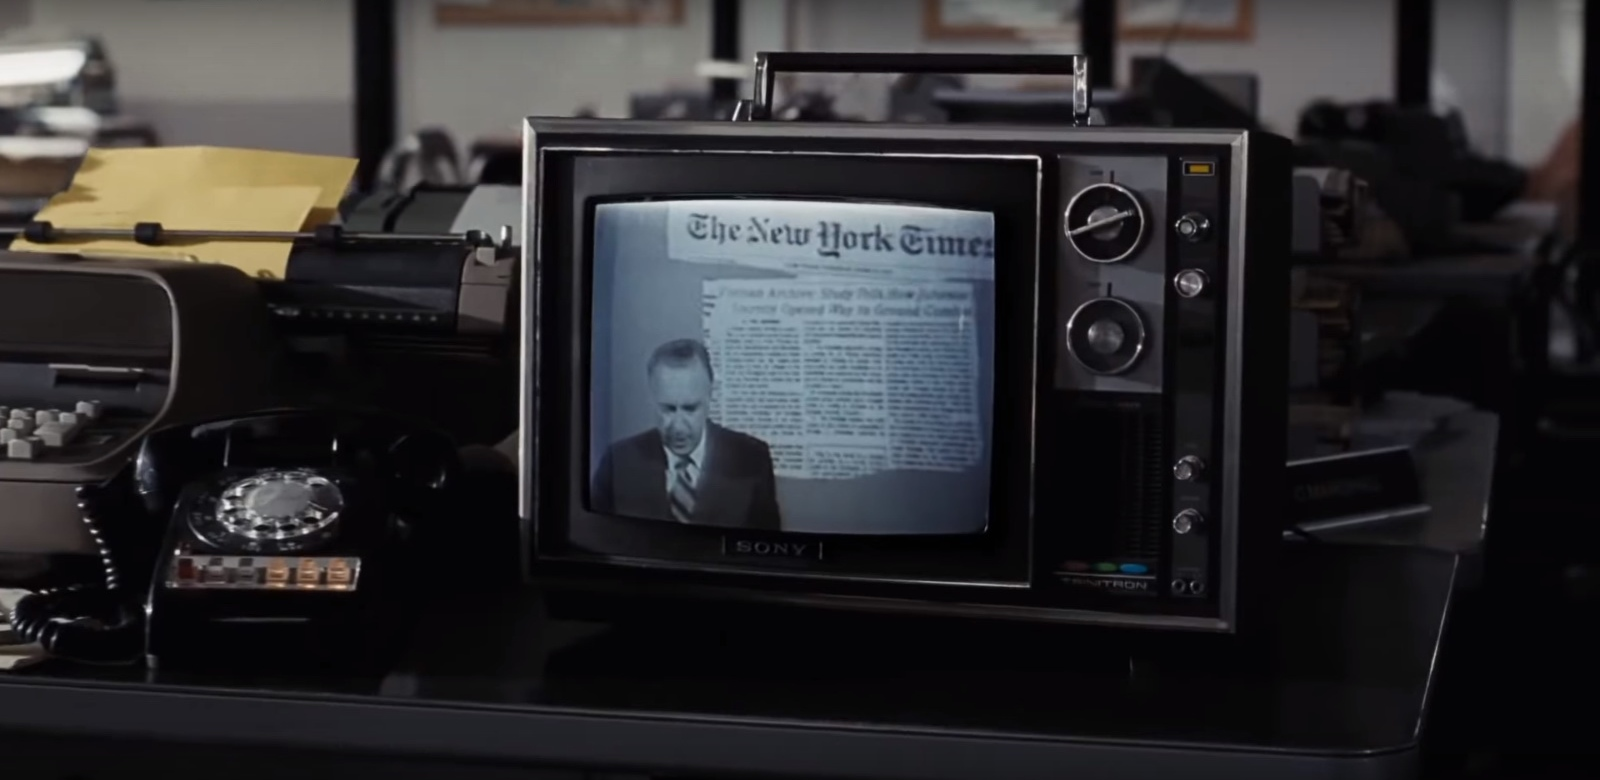 Sony Trinitron TV in The Post (2017) Movie